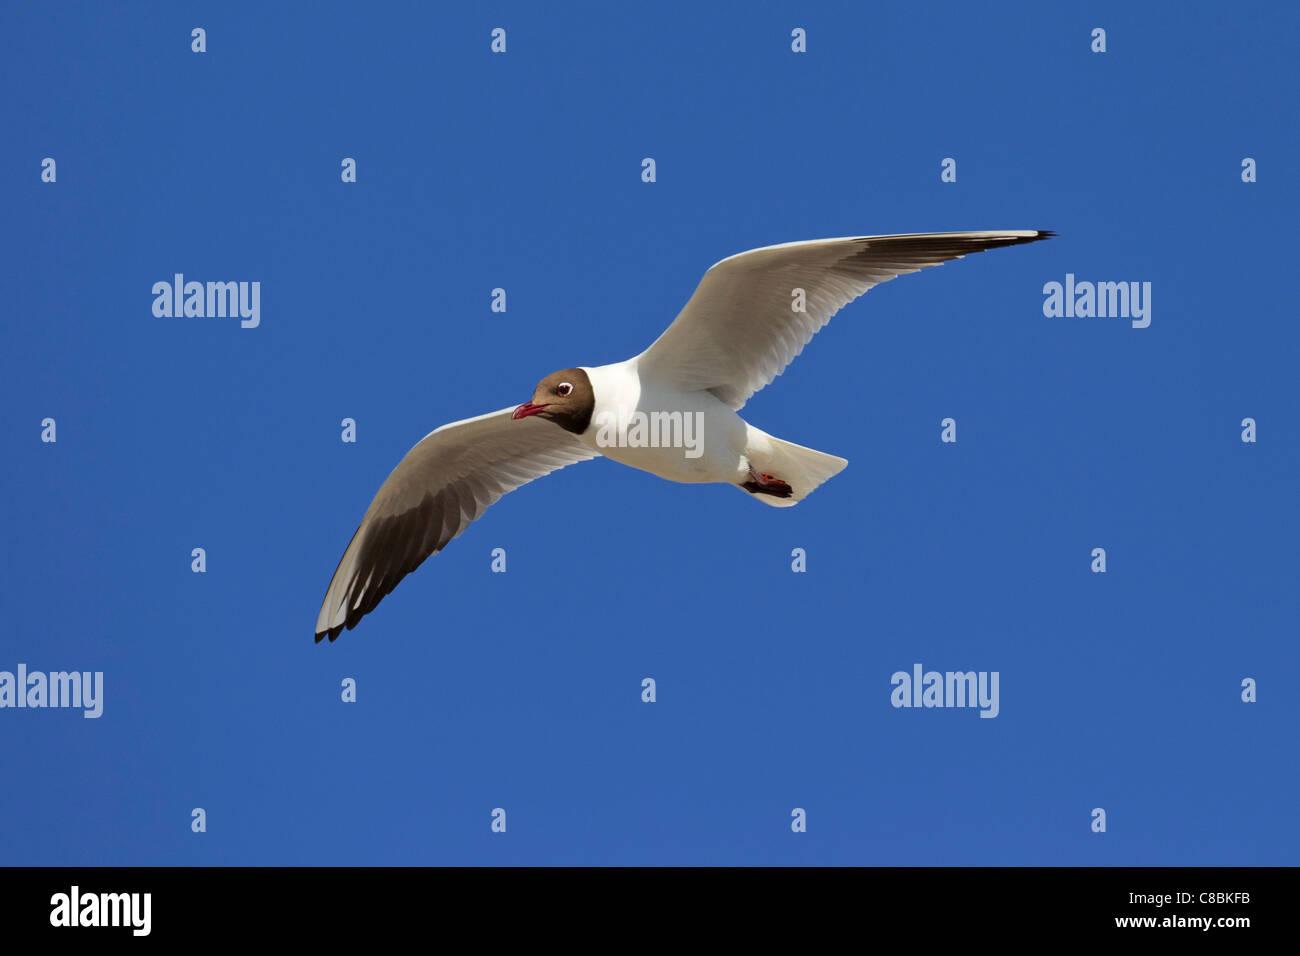 Black-headed gull (Chroicocephalus ridibundus / Larus ridibundus) in flight, Germany - Stock Image